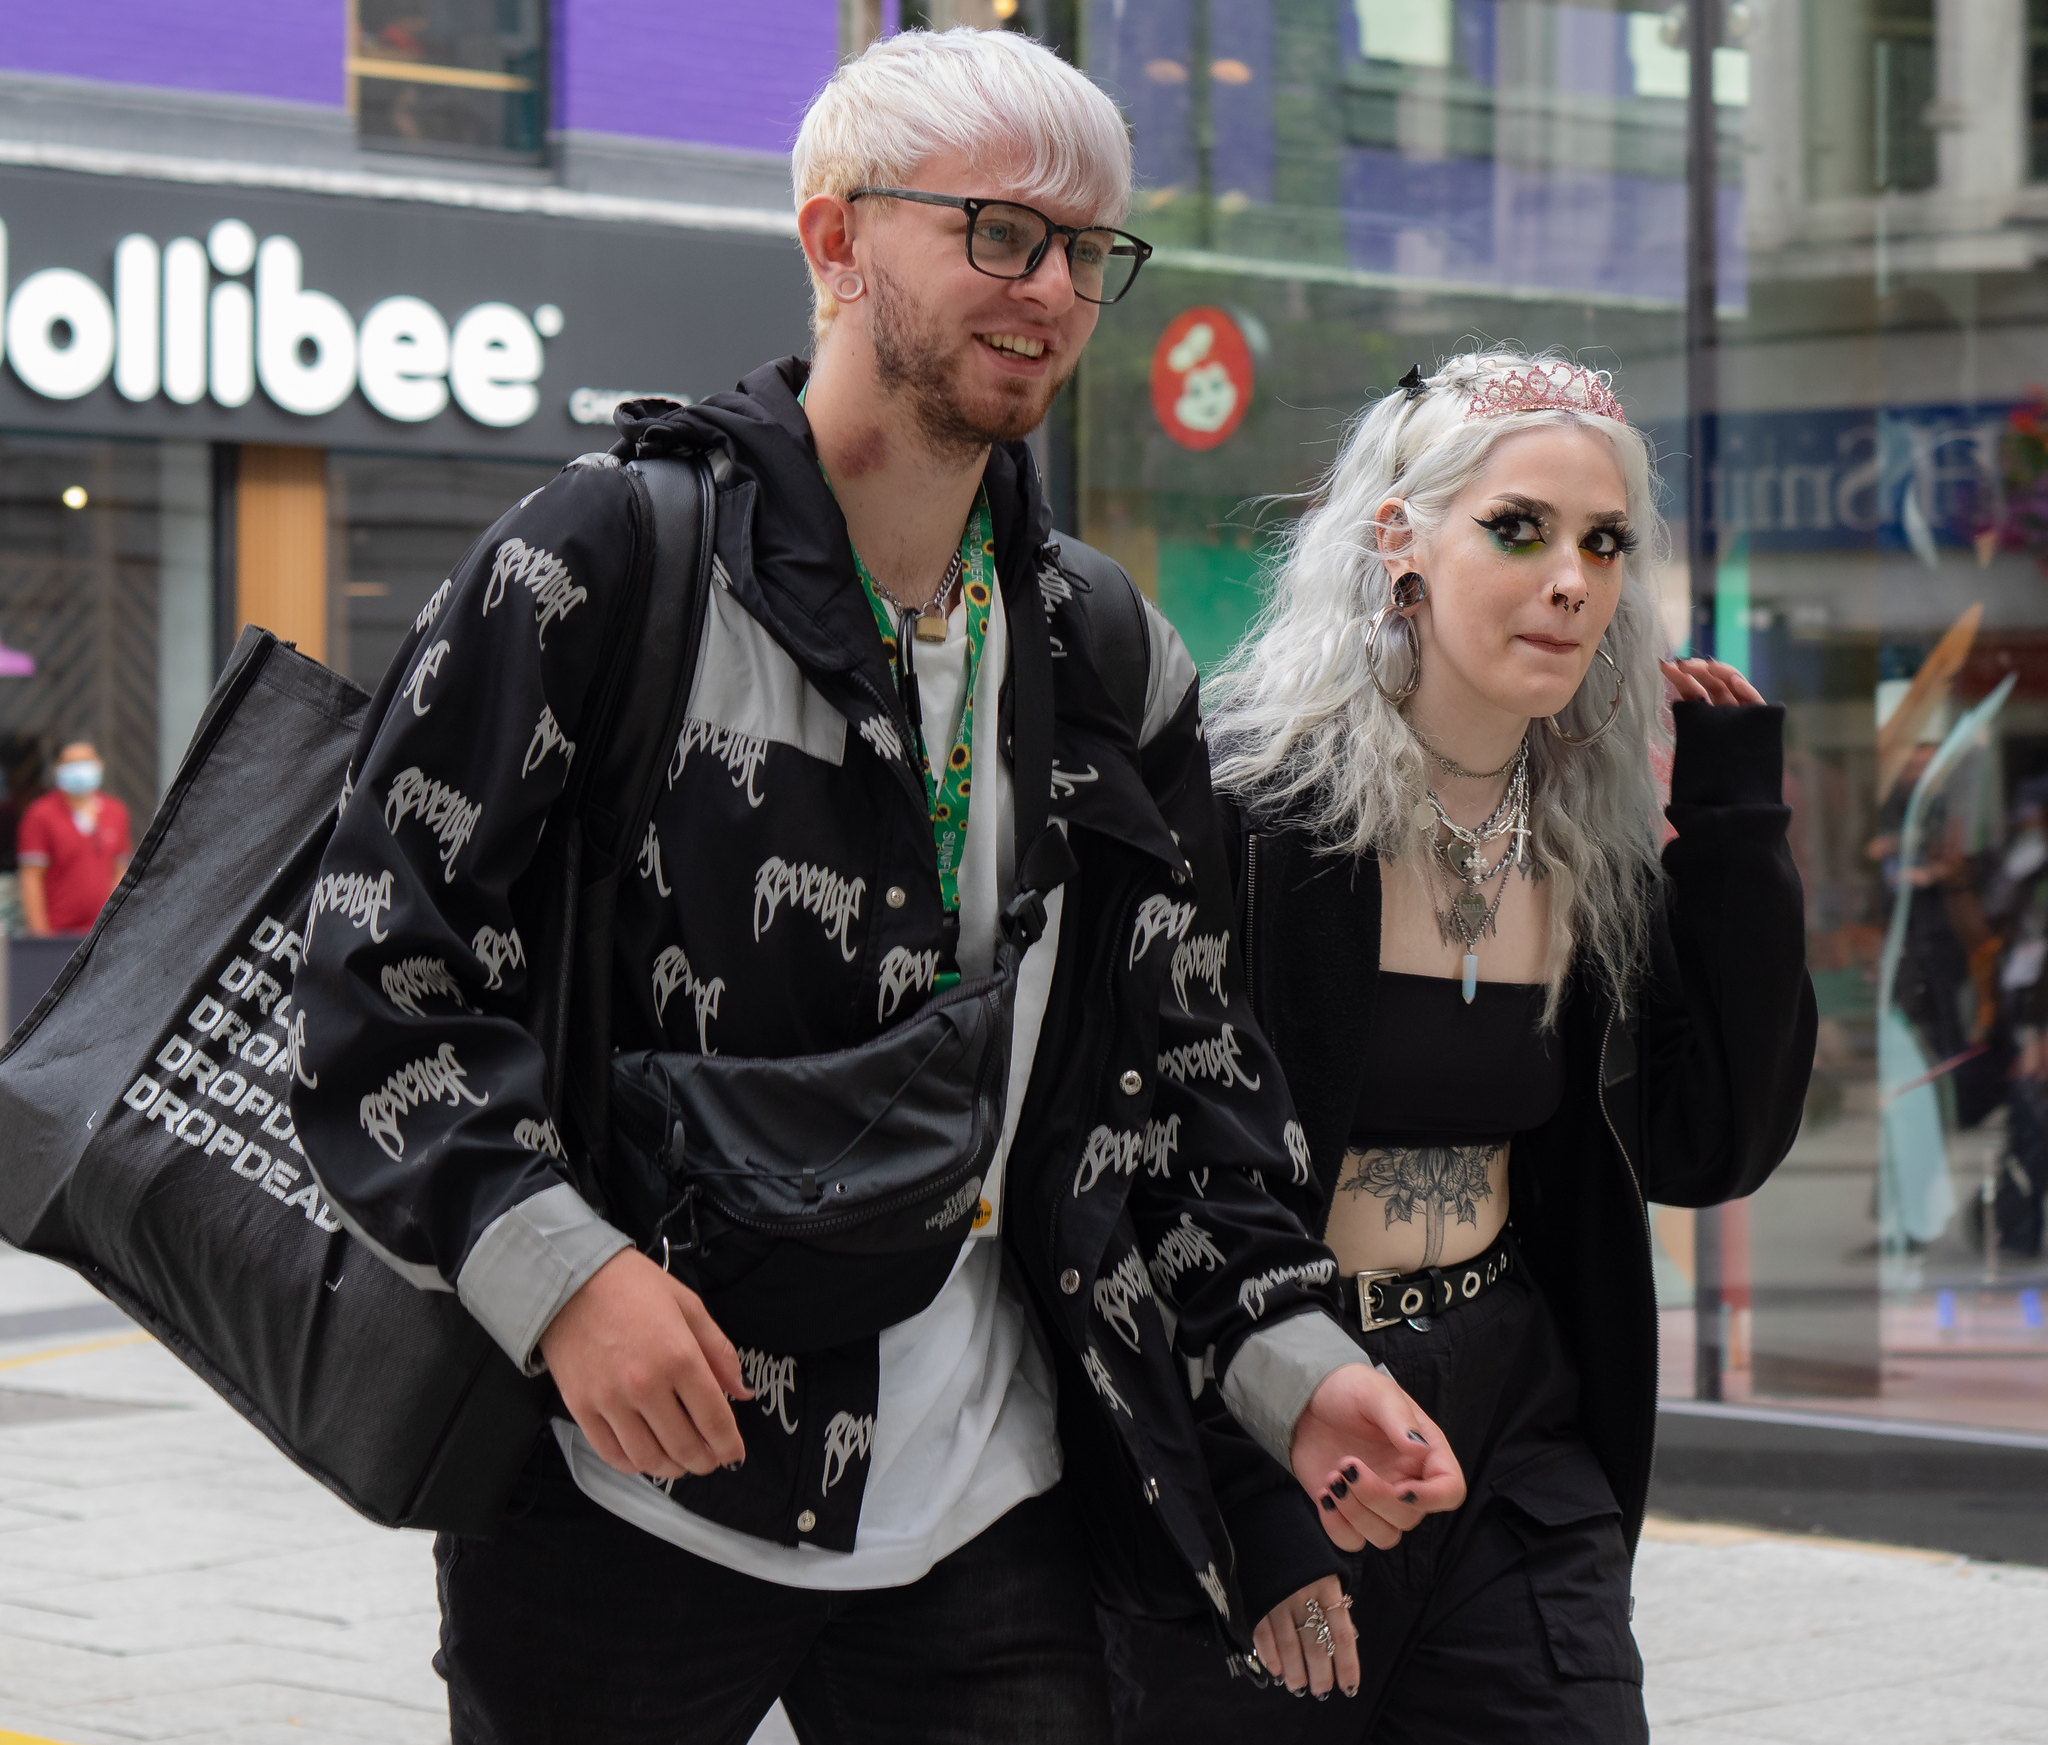 Dropdead couple